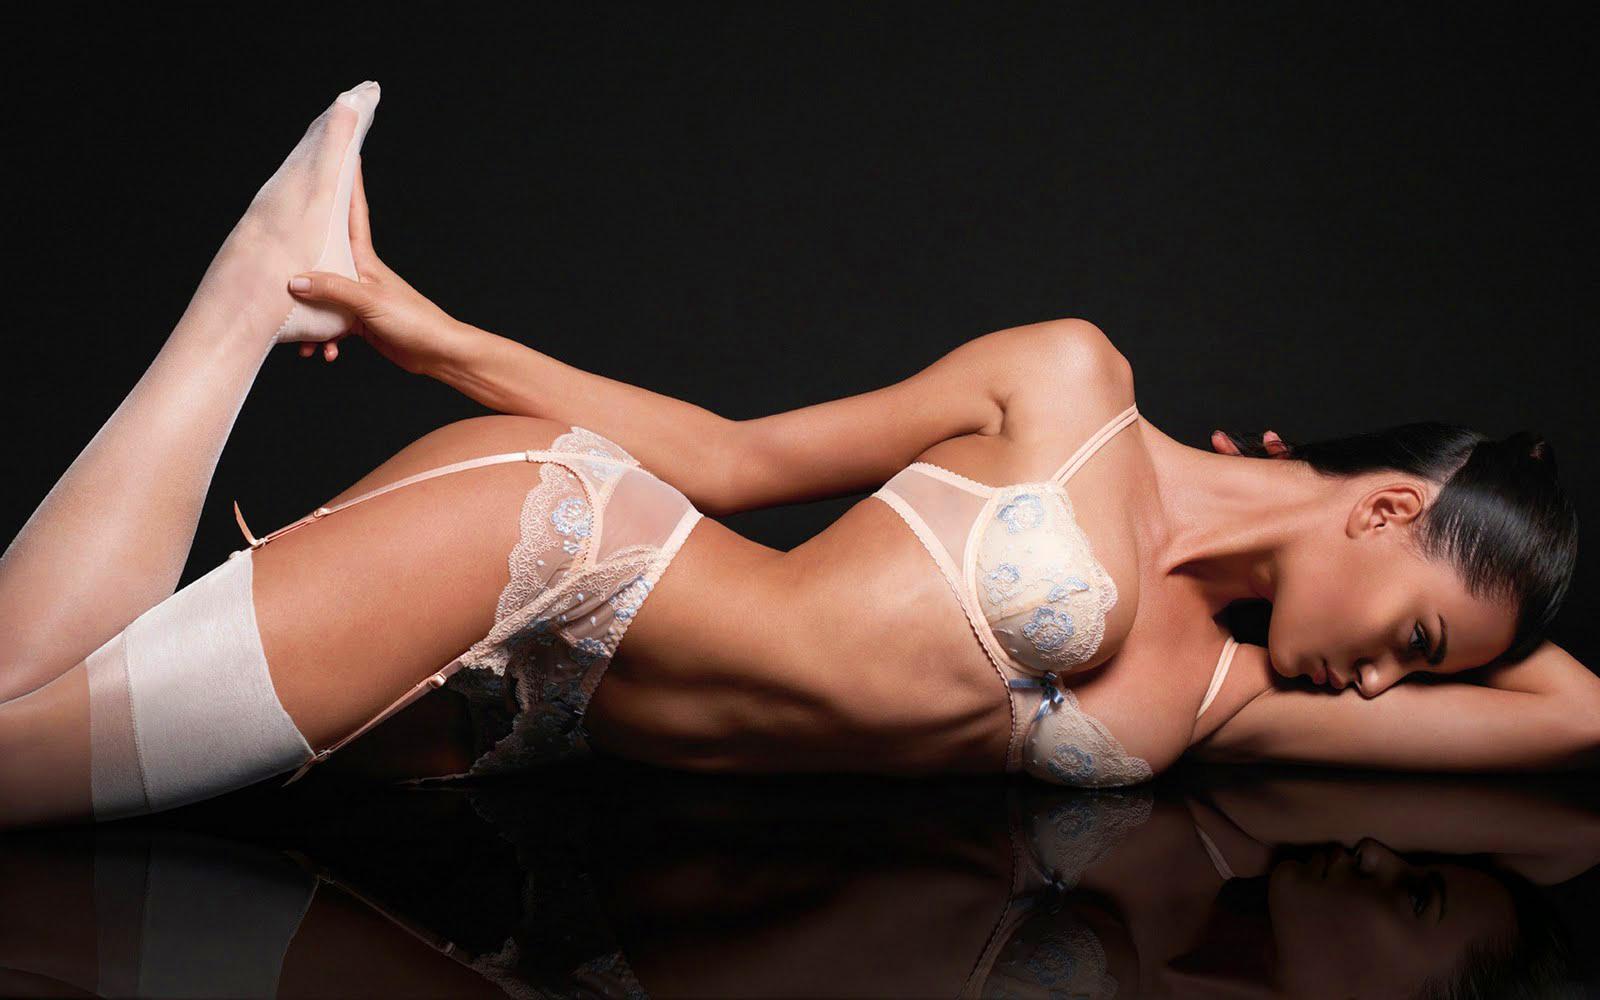 wallpapershdsize: Models Wallpapers - Sexy Models - Under ...